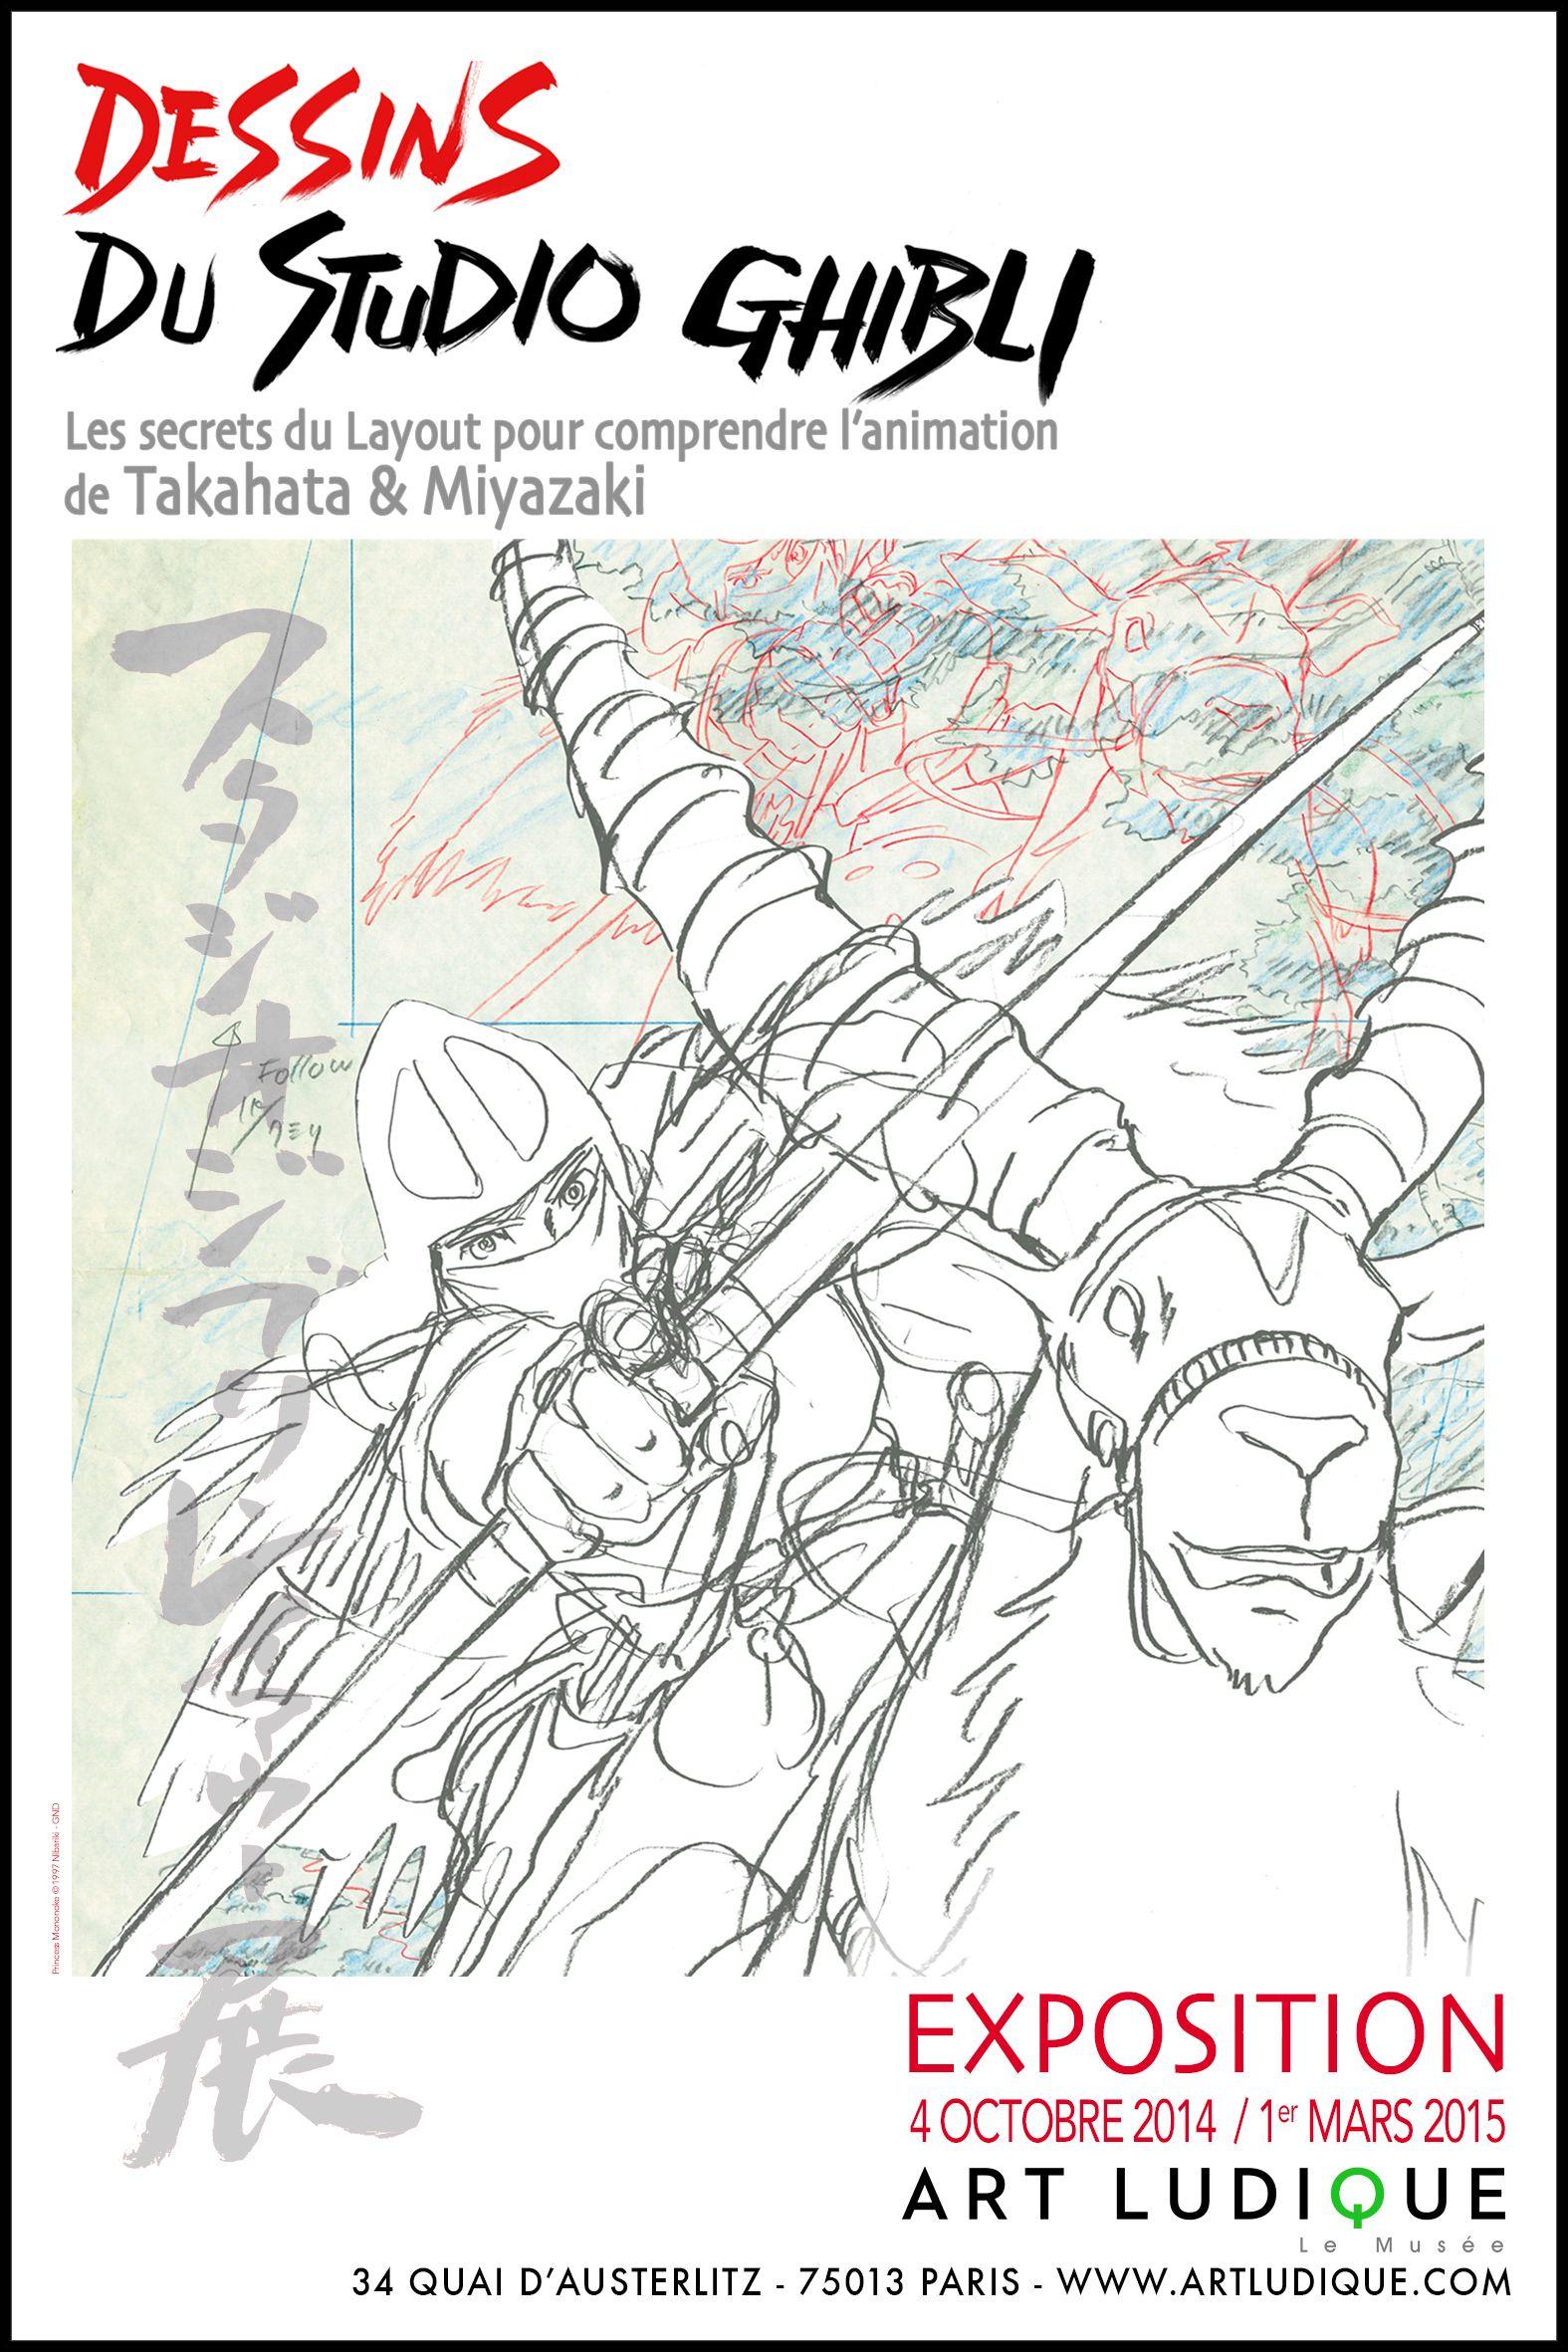 Exposition Dessins Du Studio Ghibli : exposition, dessins, studio, ghibli, Exposition], Dessins, Studio, Ghibli, Musée, Ludique, Ludique,, Ghibli,, Exposition